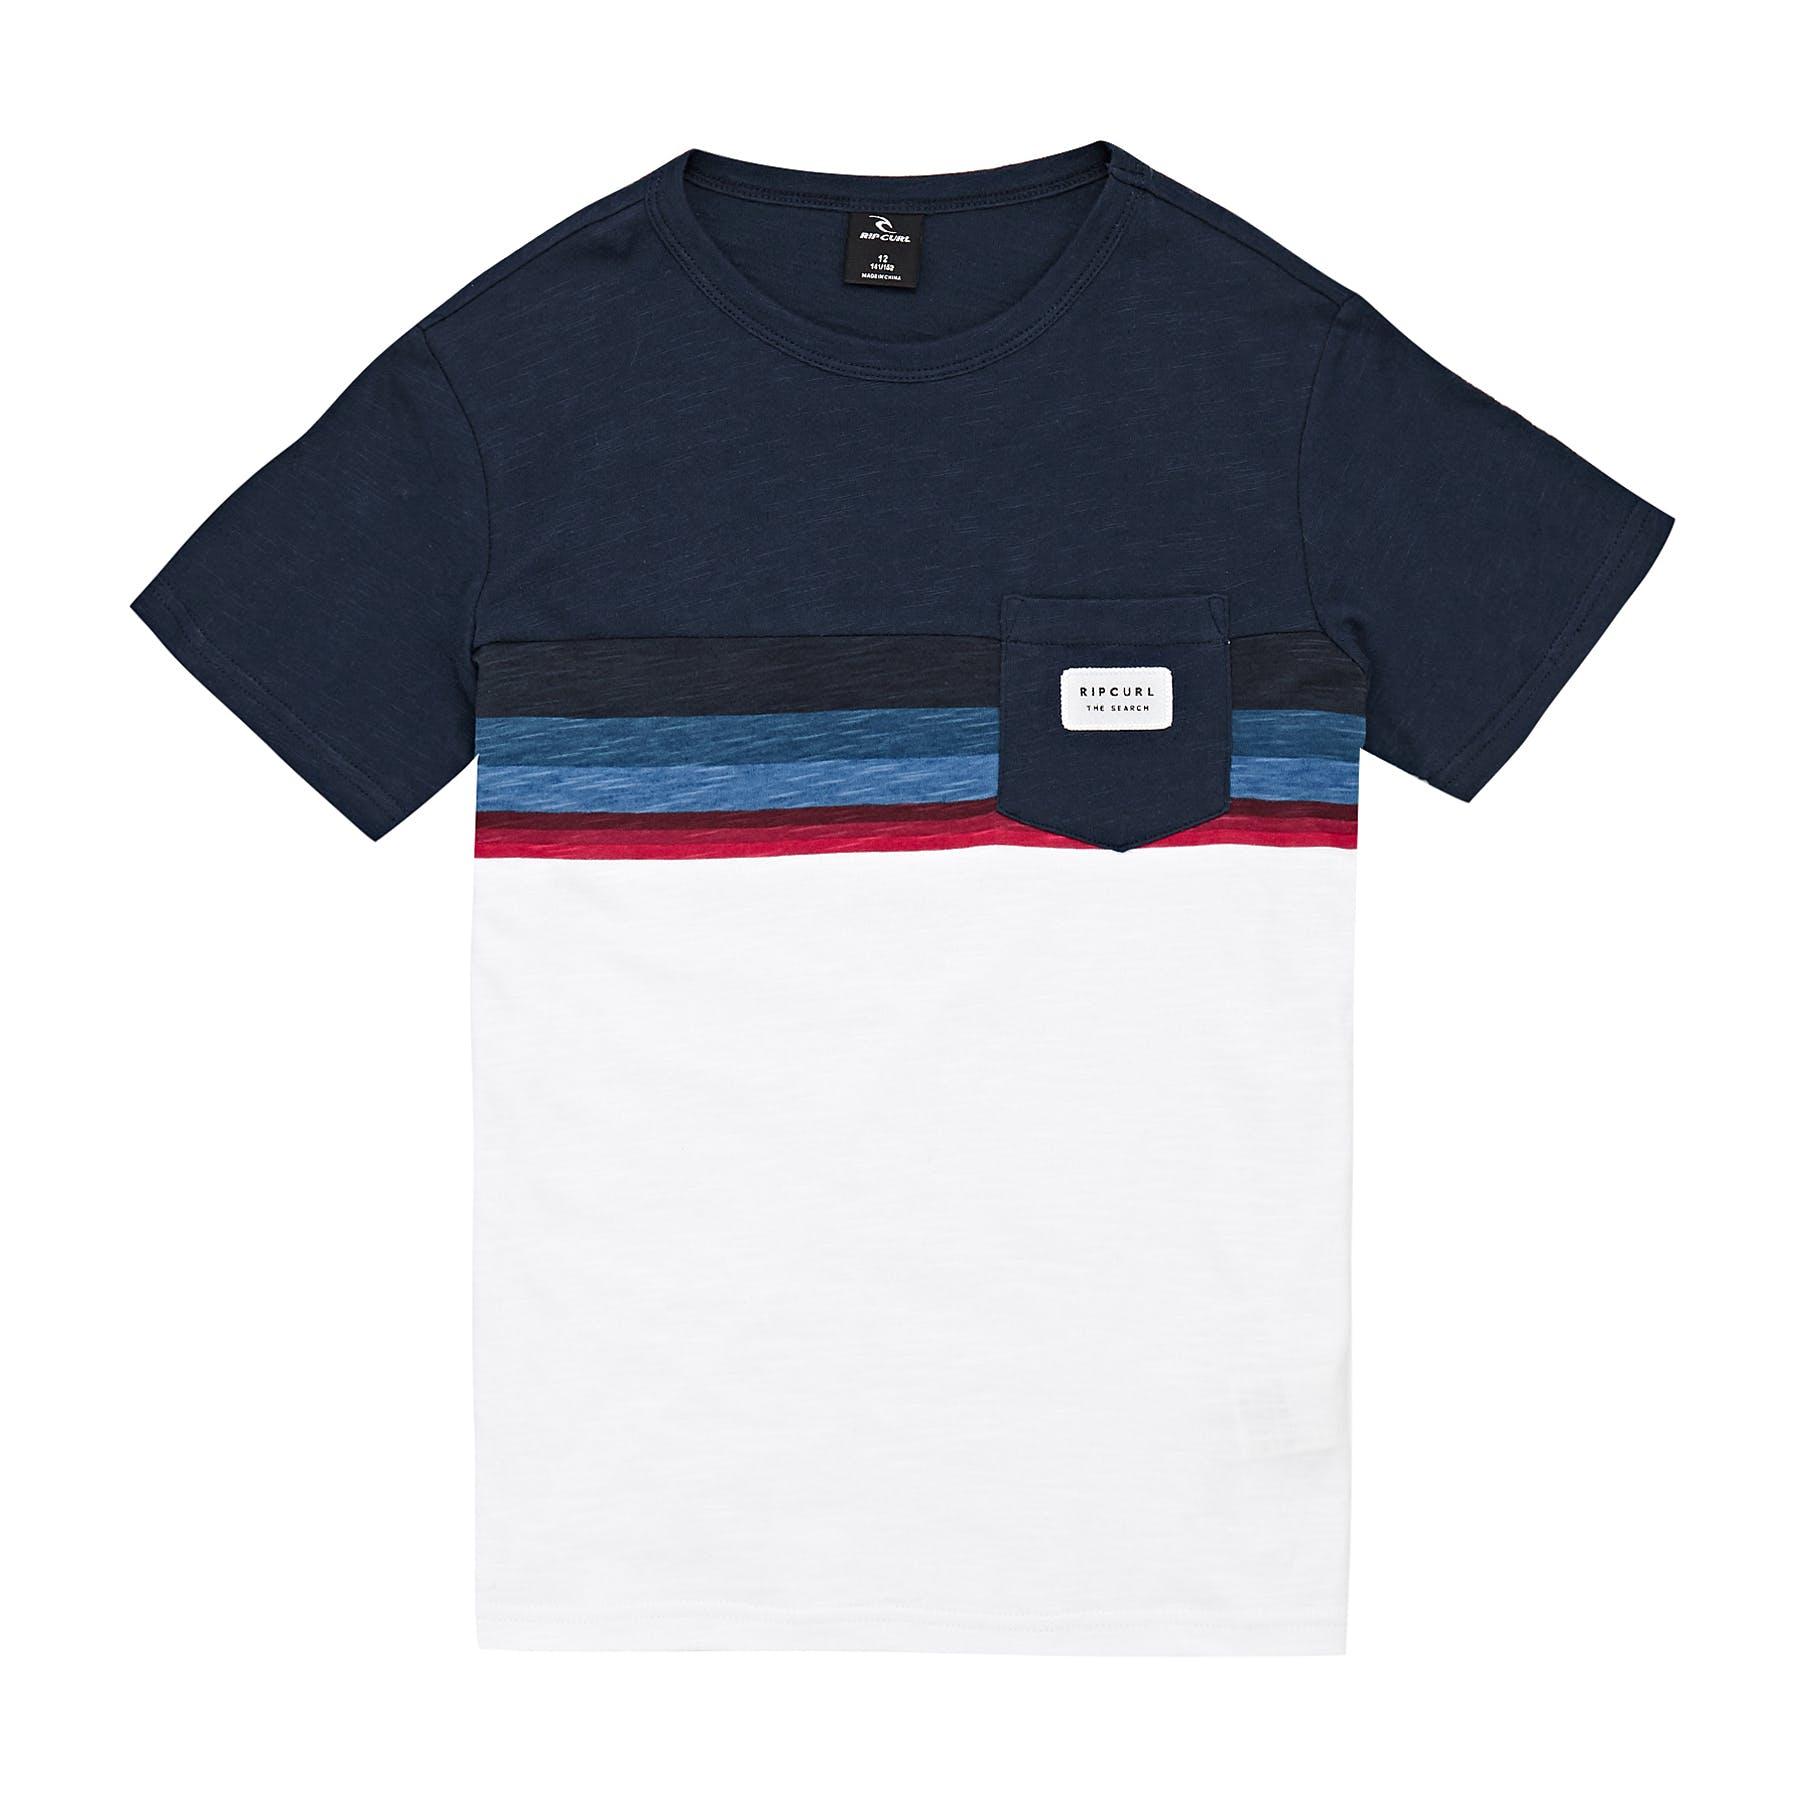 Rip Curl Rapture Short Sleeve T-Shirt in Dark Denim